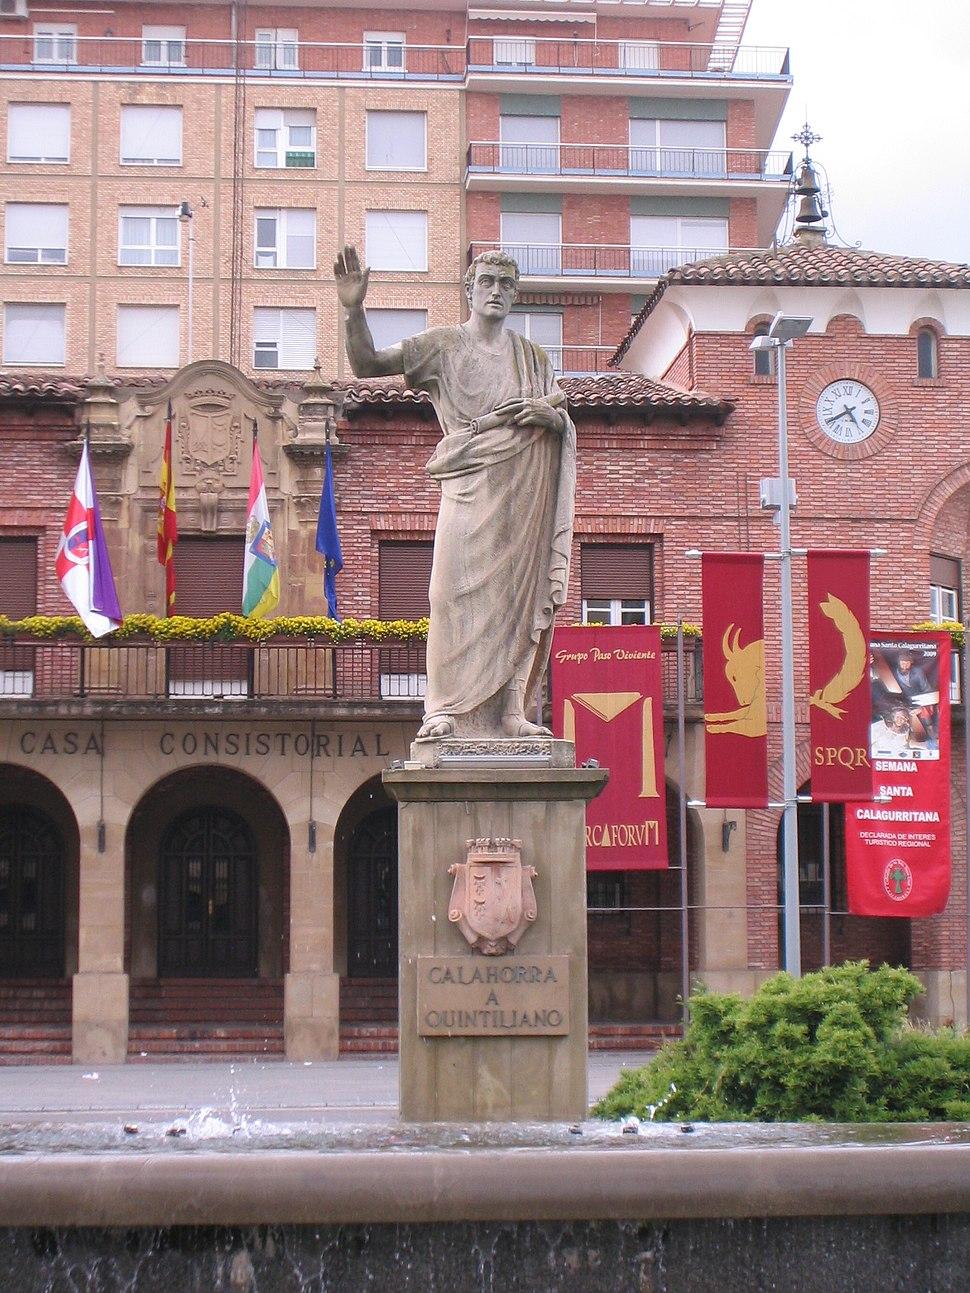 Calahorra, estatua de Quintiliano